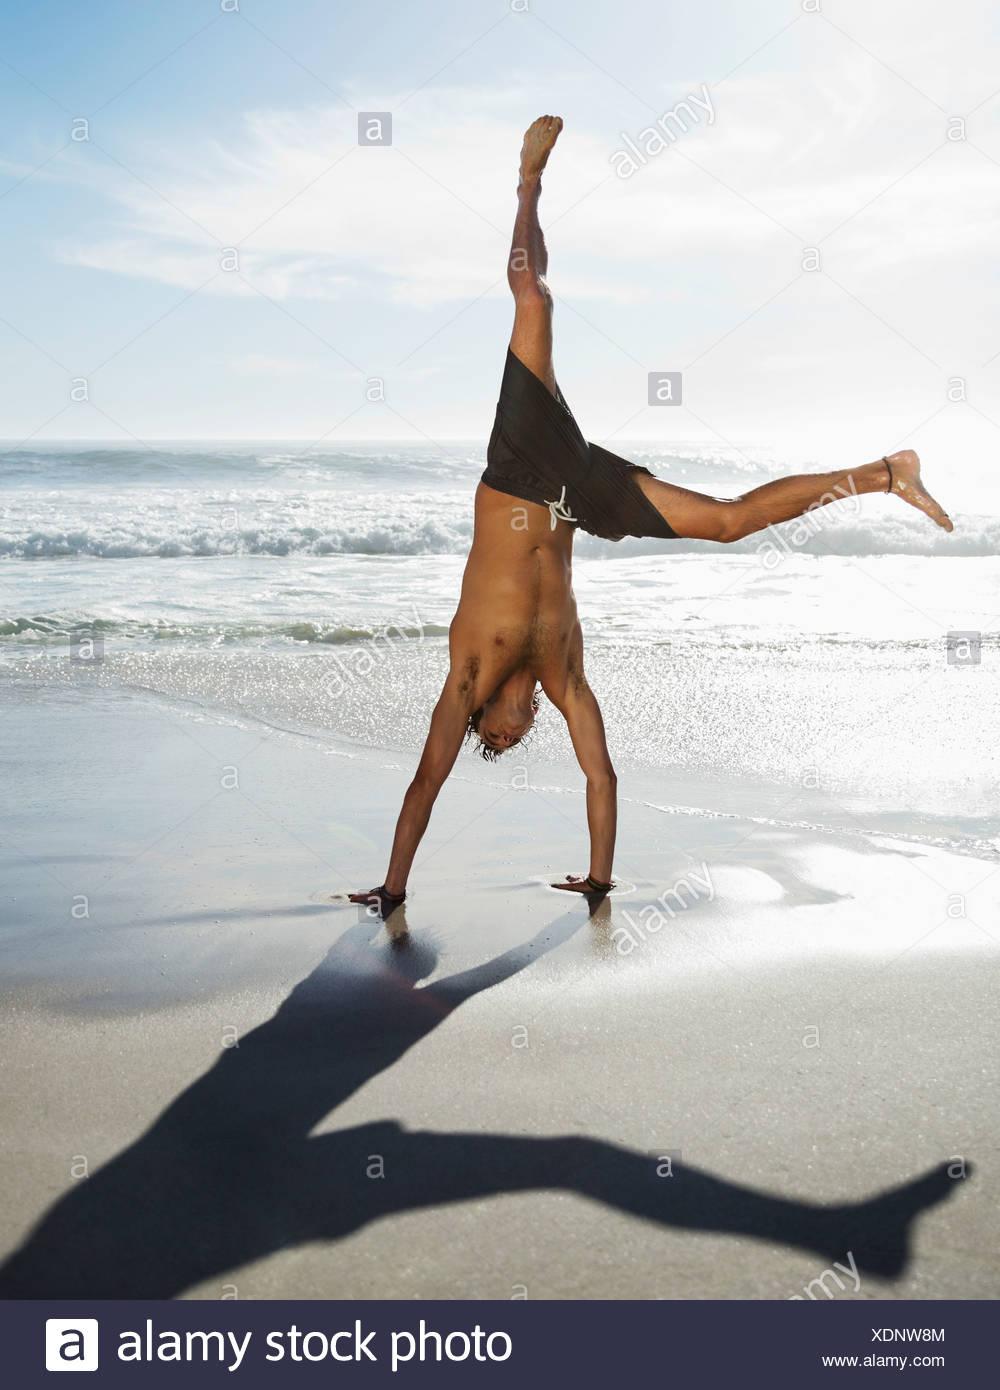 Man in swim trunks doing handstand on beach - Stock Image